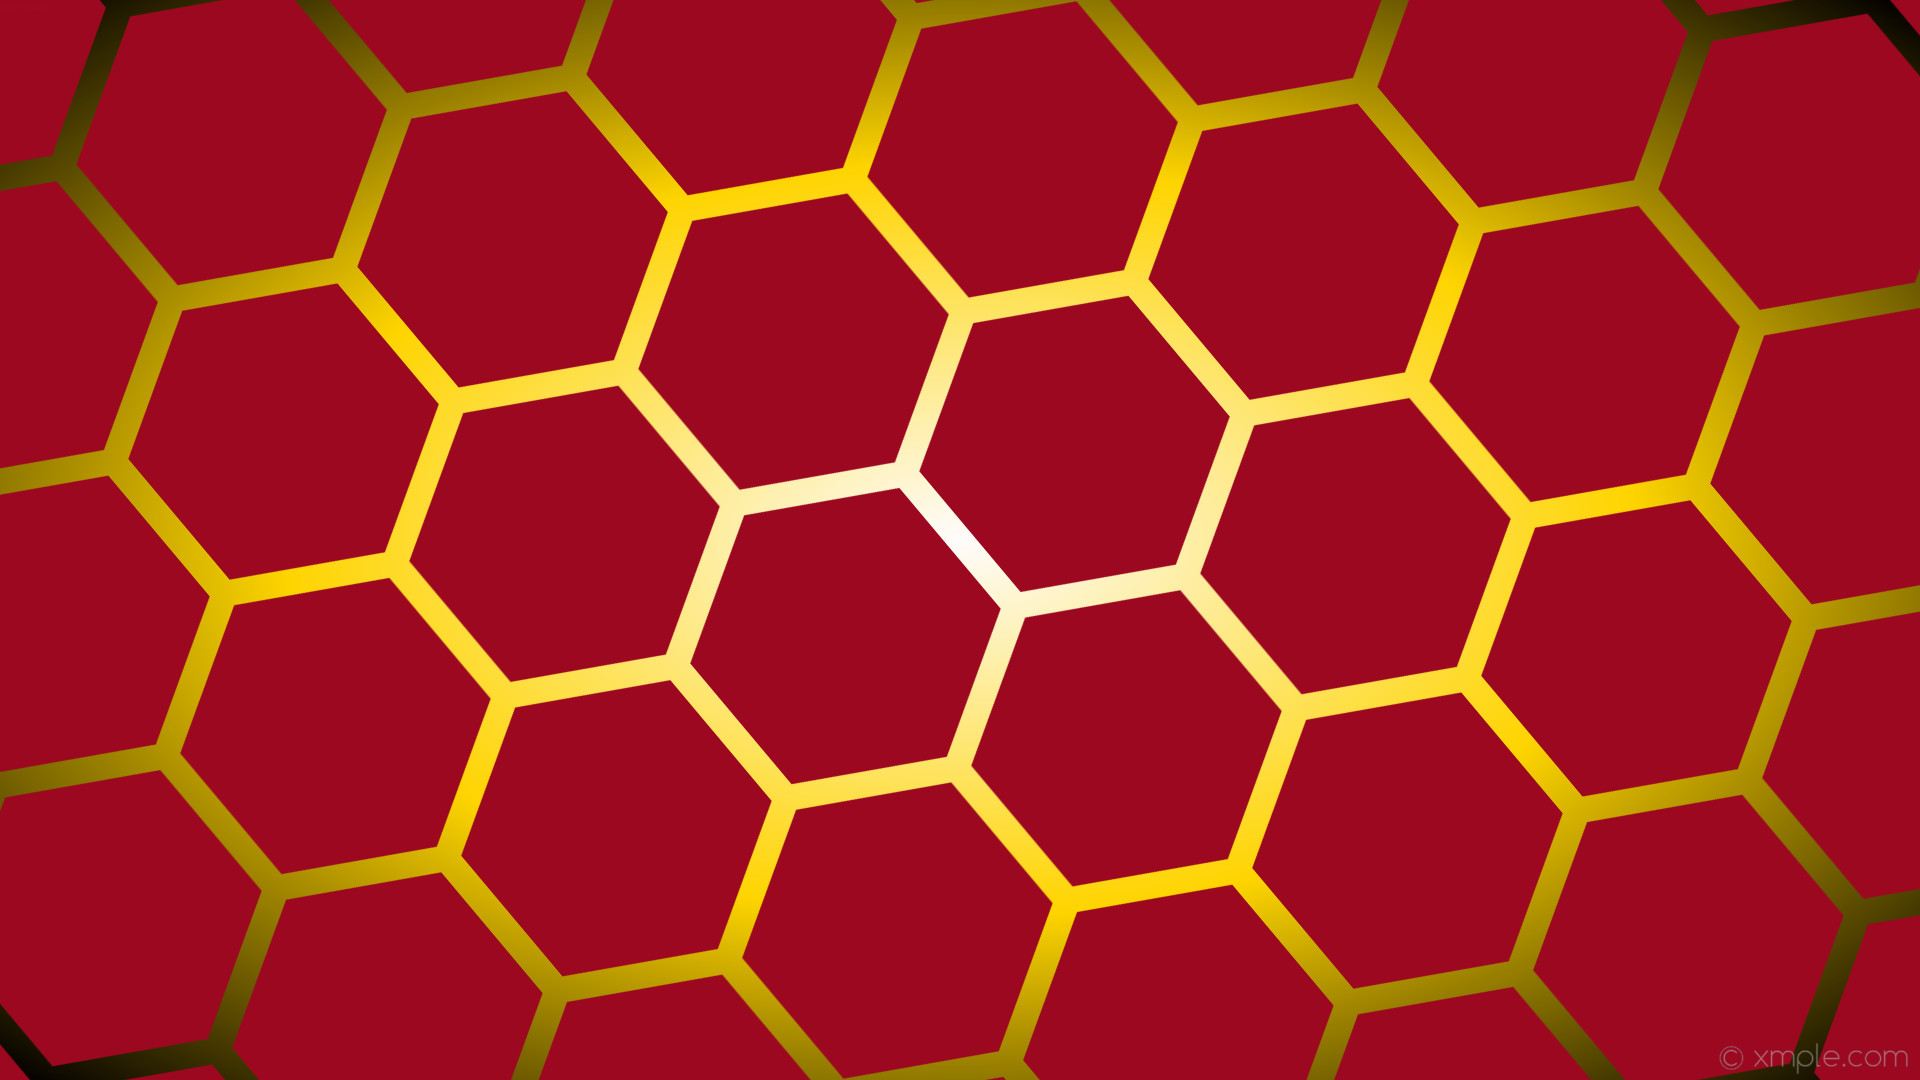 wallpaper yellow glow black red gradient hexagon white gold #9b0820 #ffffff  #ffd700 diagonal